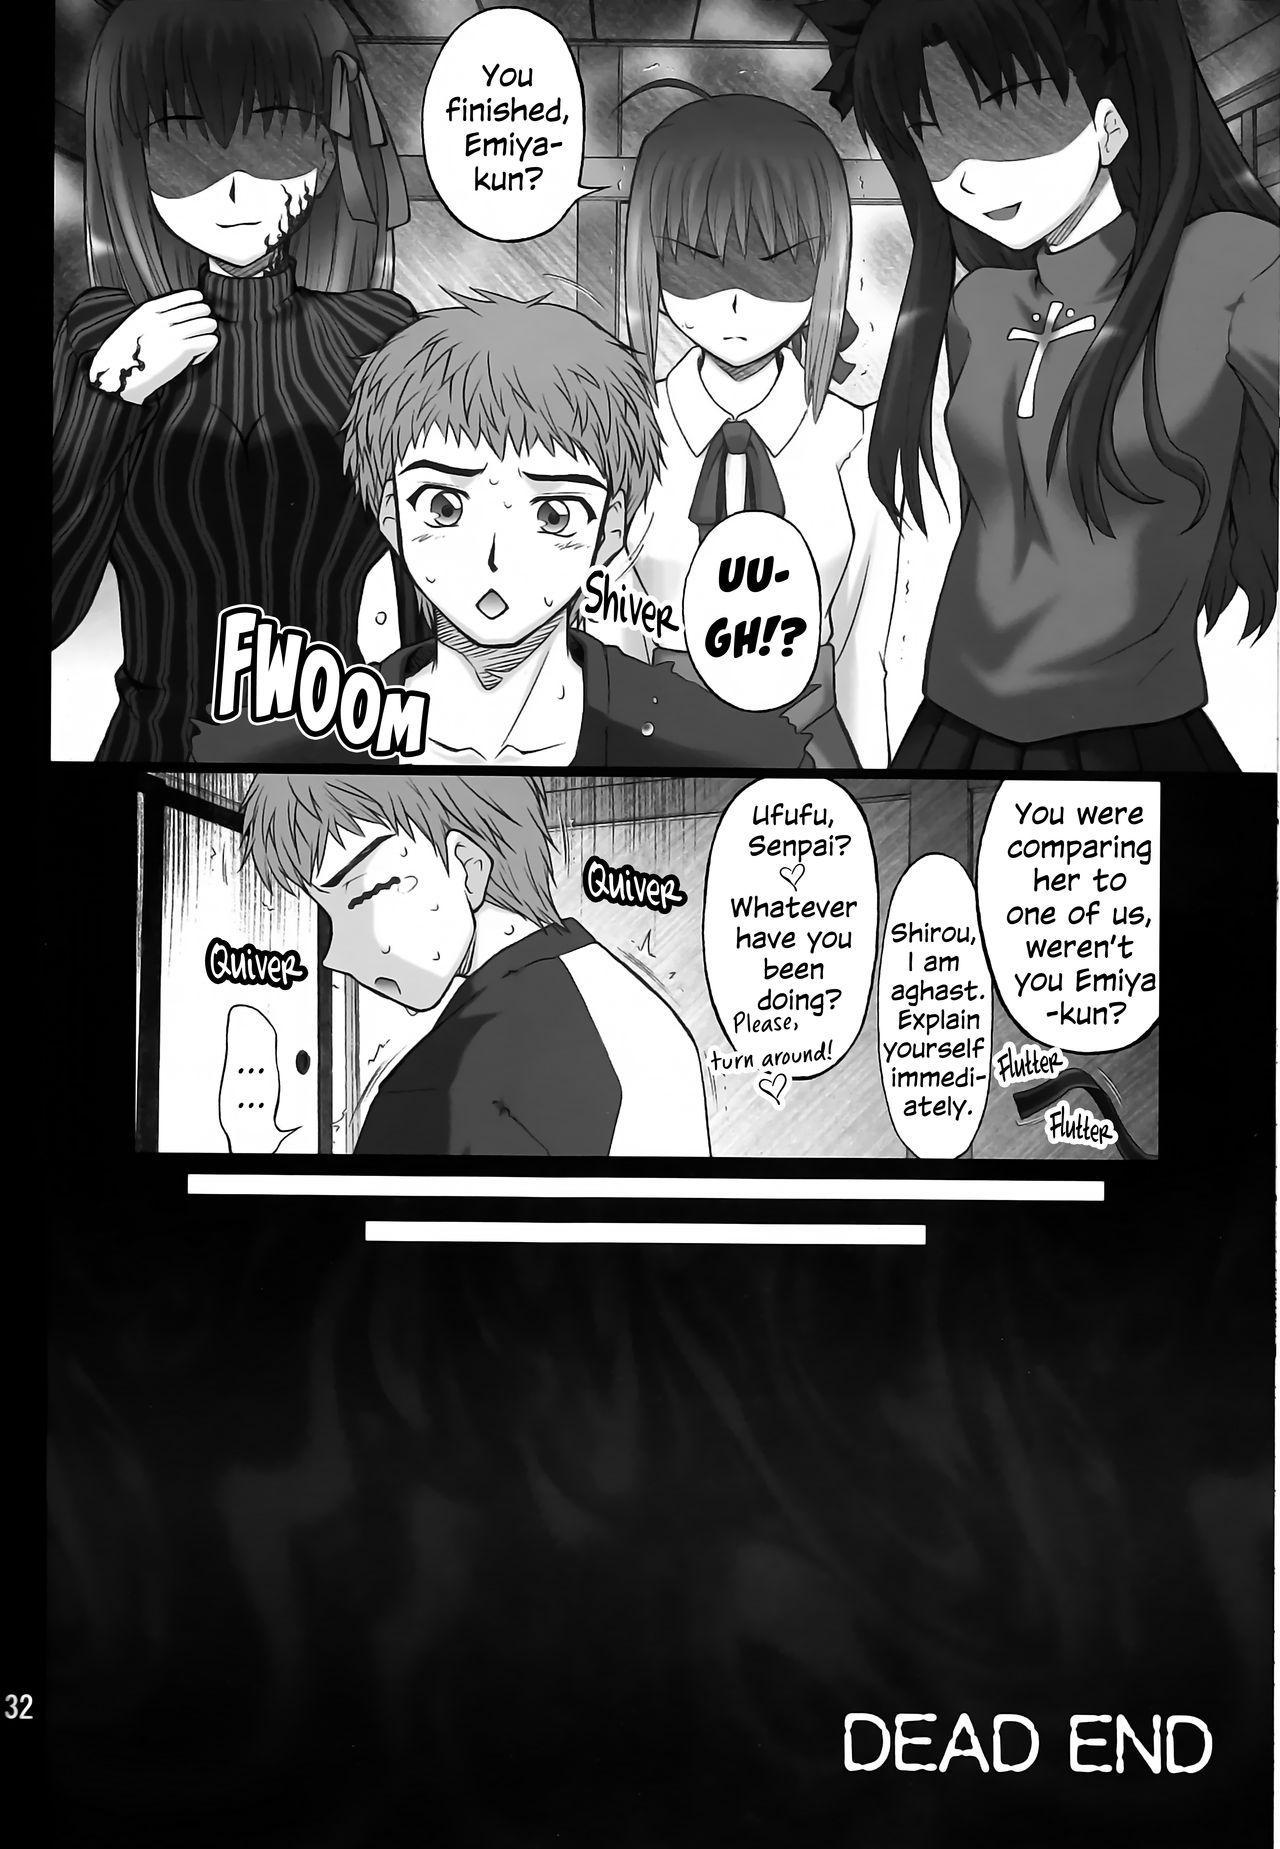 (COMIC1) [PURIMONO (Goyac)] Nekotora -Nekoka no Onee-san wa Suki desu ka?- | Cat Tiger: Do you like feline big sisters? Fate/Stay Afternoon (Fate/stay night) [English] [EHCOVE] 30